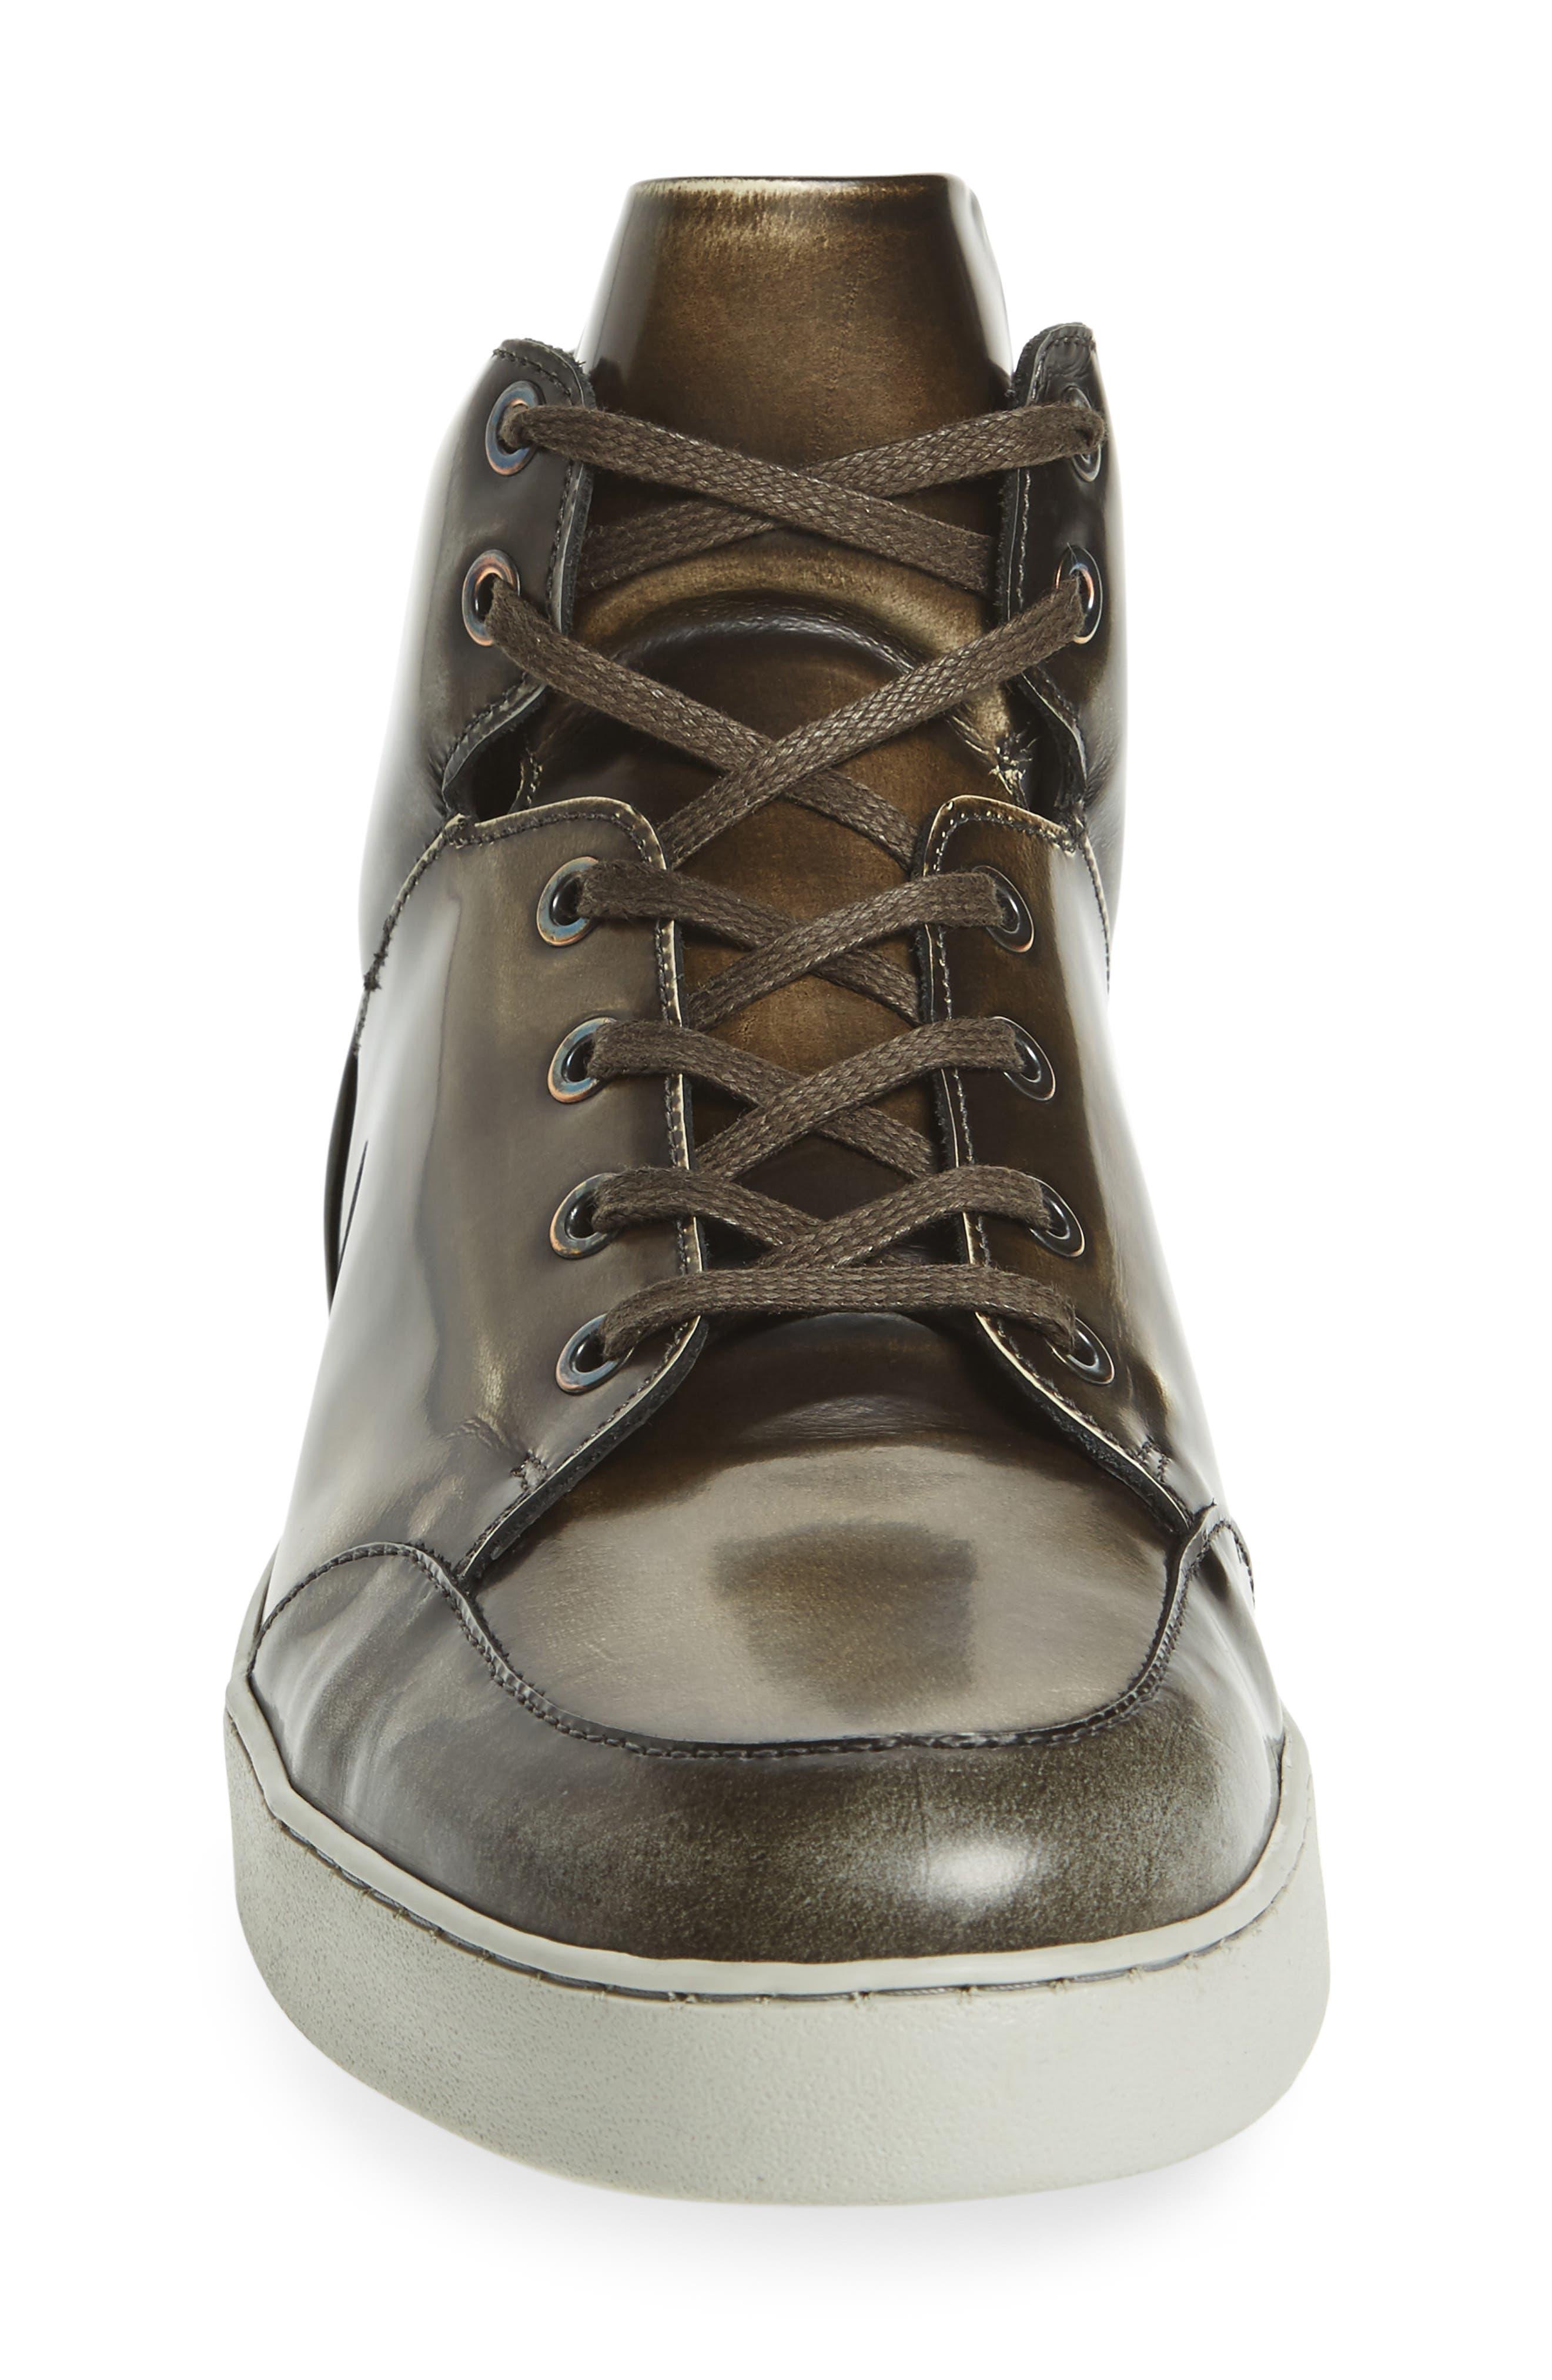 Gidean High Top Sneaker,                             Alternate thumbnail 3, color,                             006